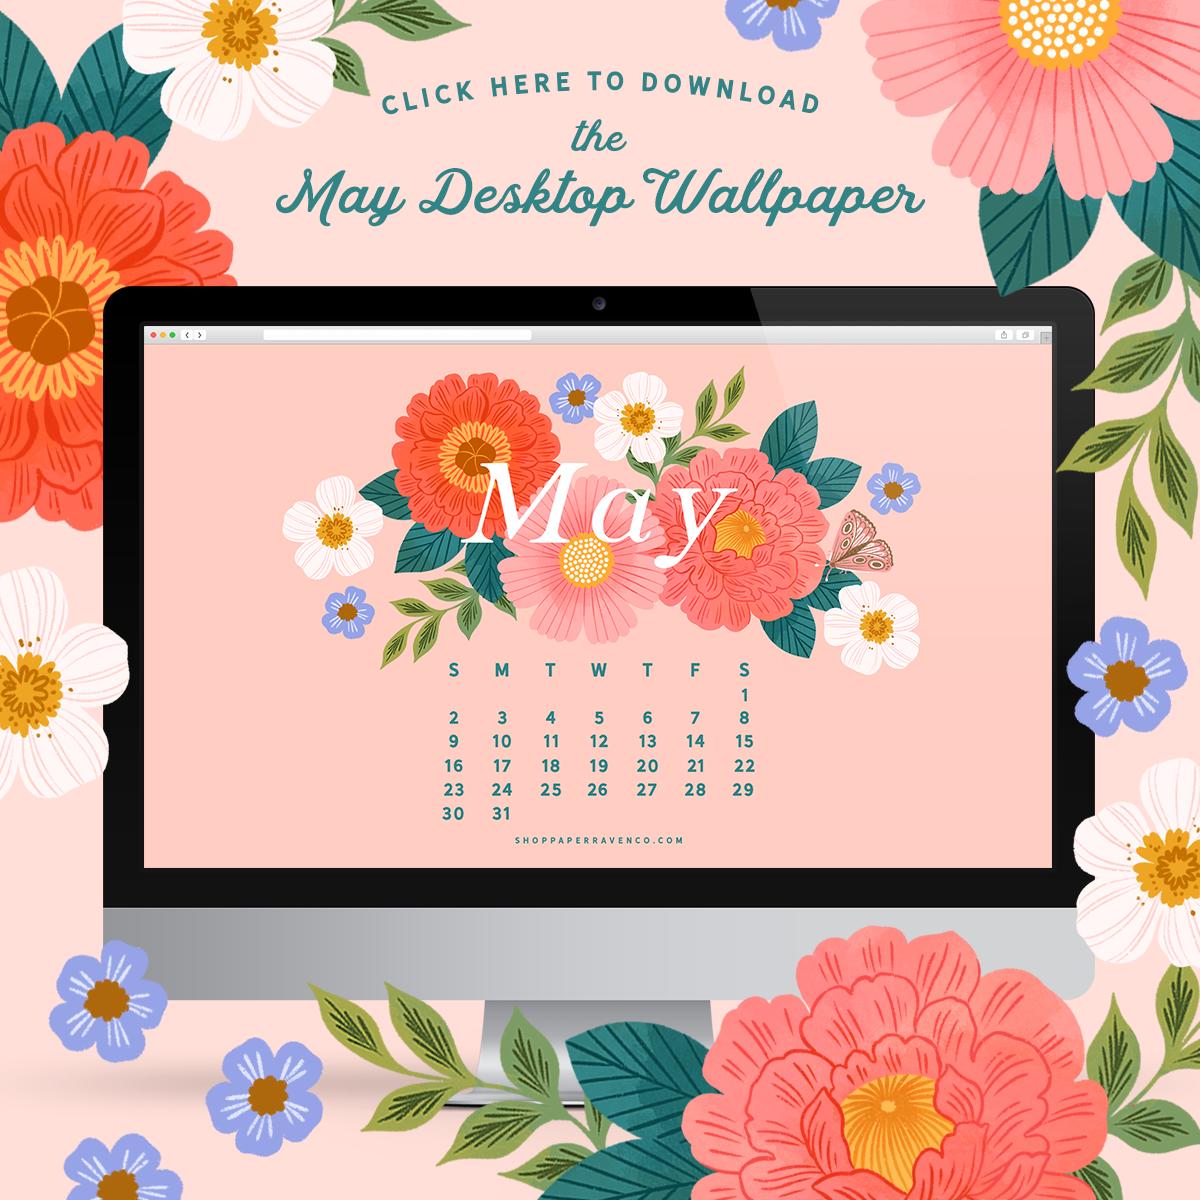 May 2021 Illustrated Desktop Wallpaper by Paper Raven Co. #dressyourtech #desktopwallpaper #desktopdownload